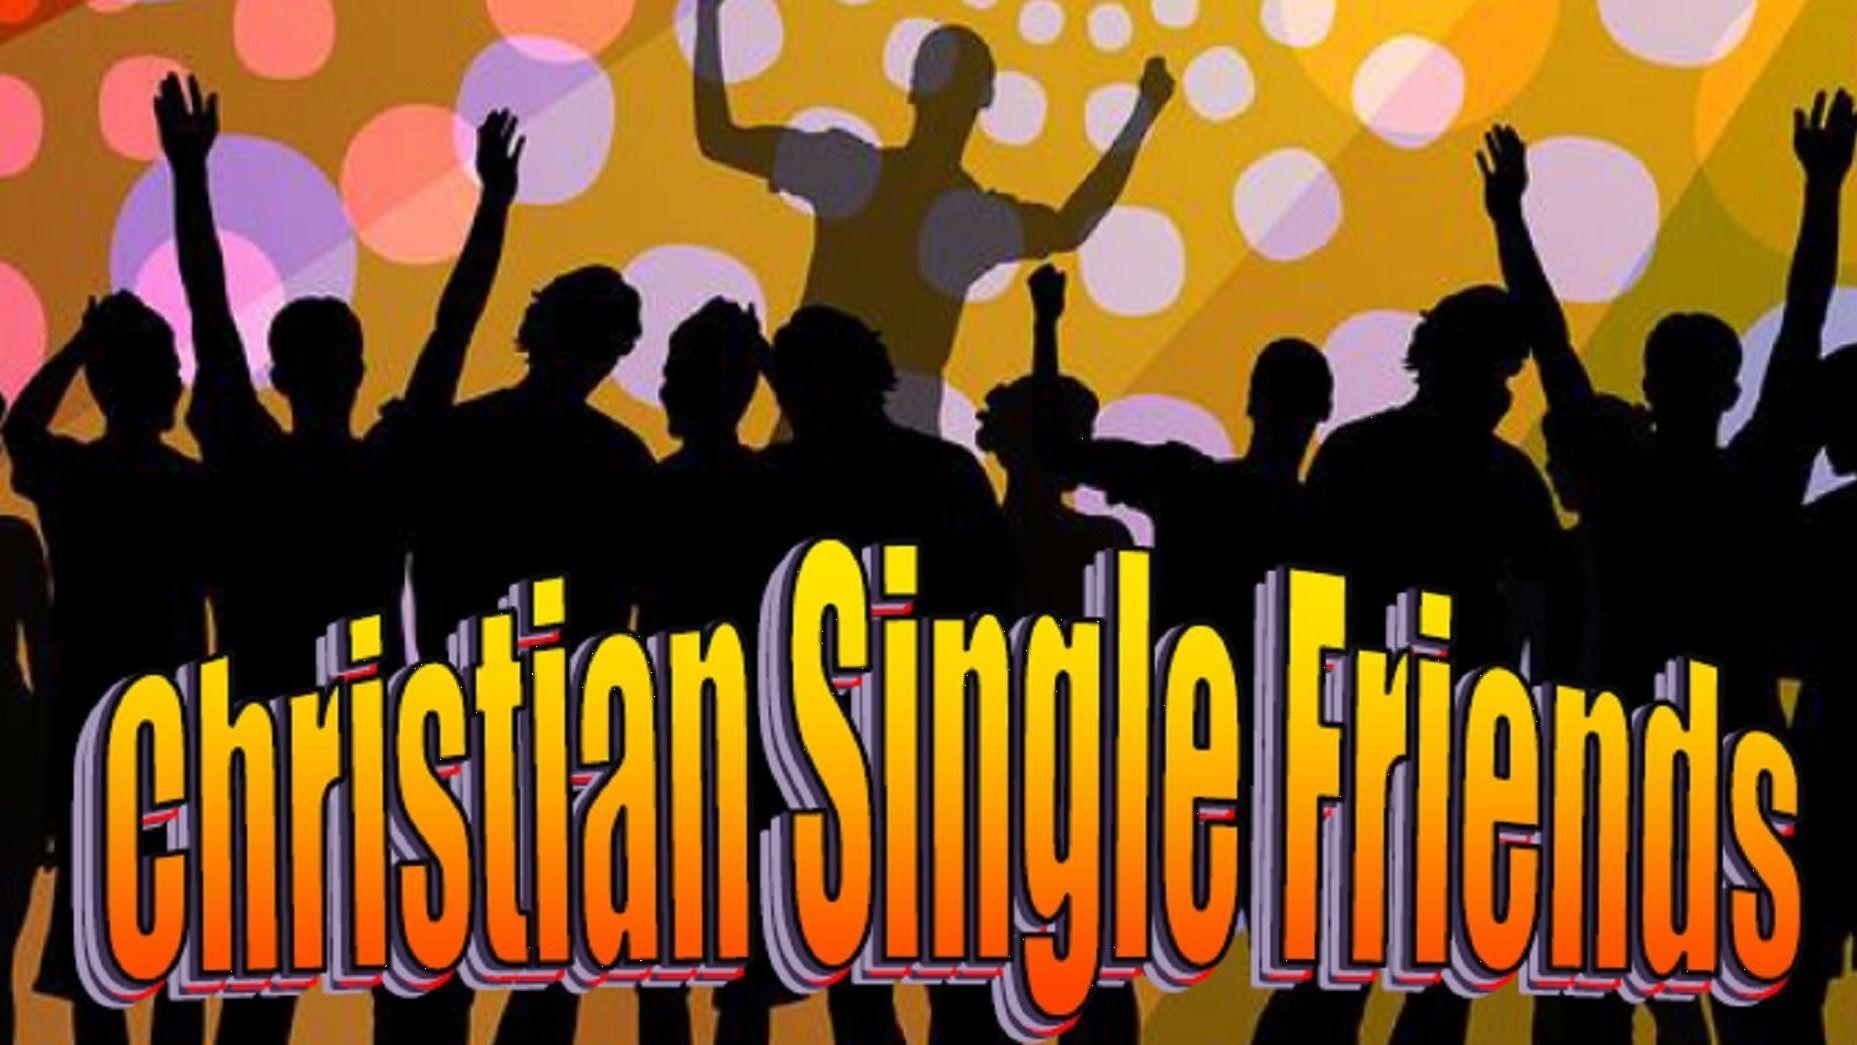 Christian Single Friends